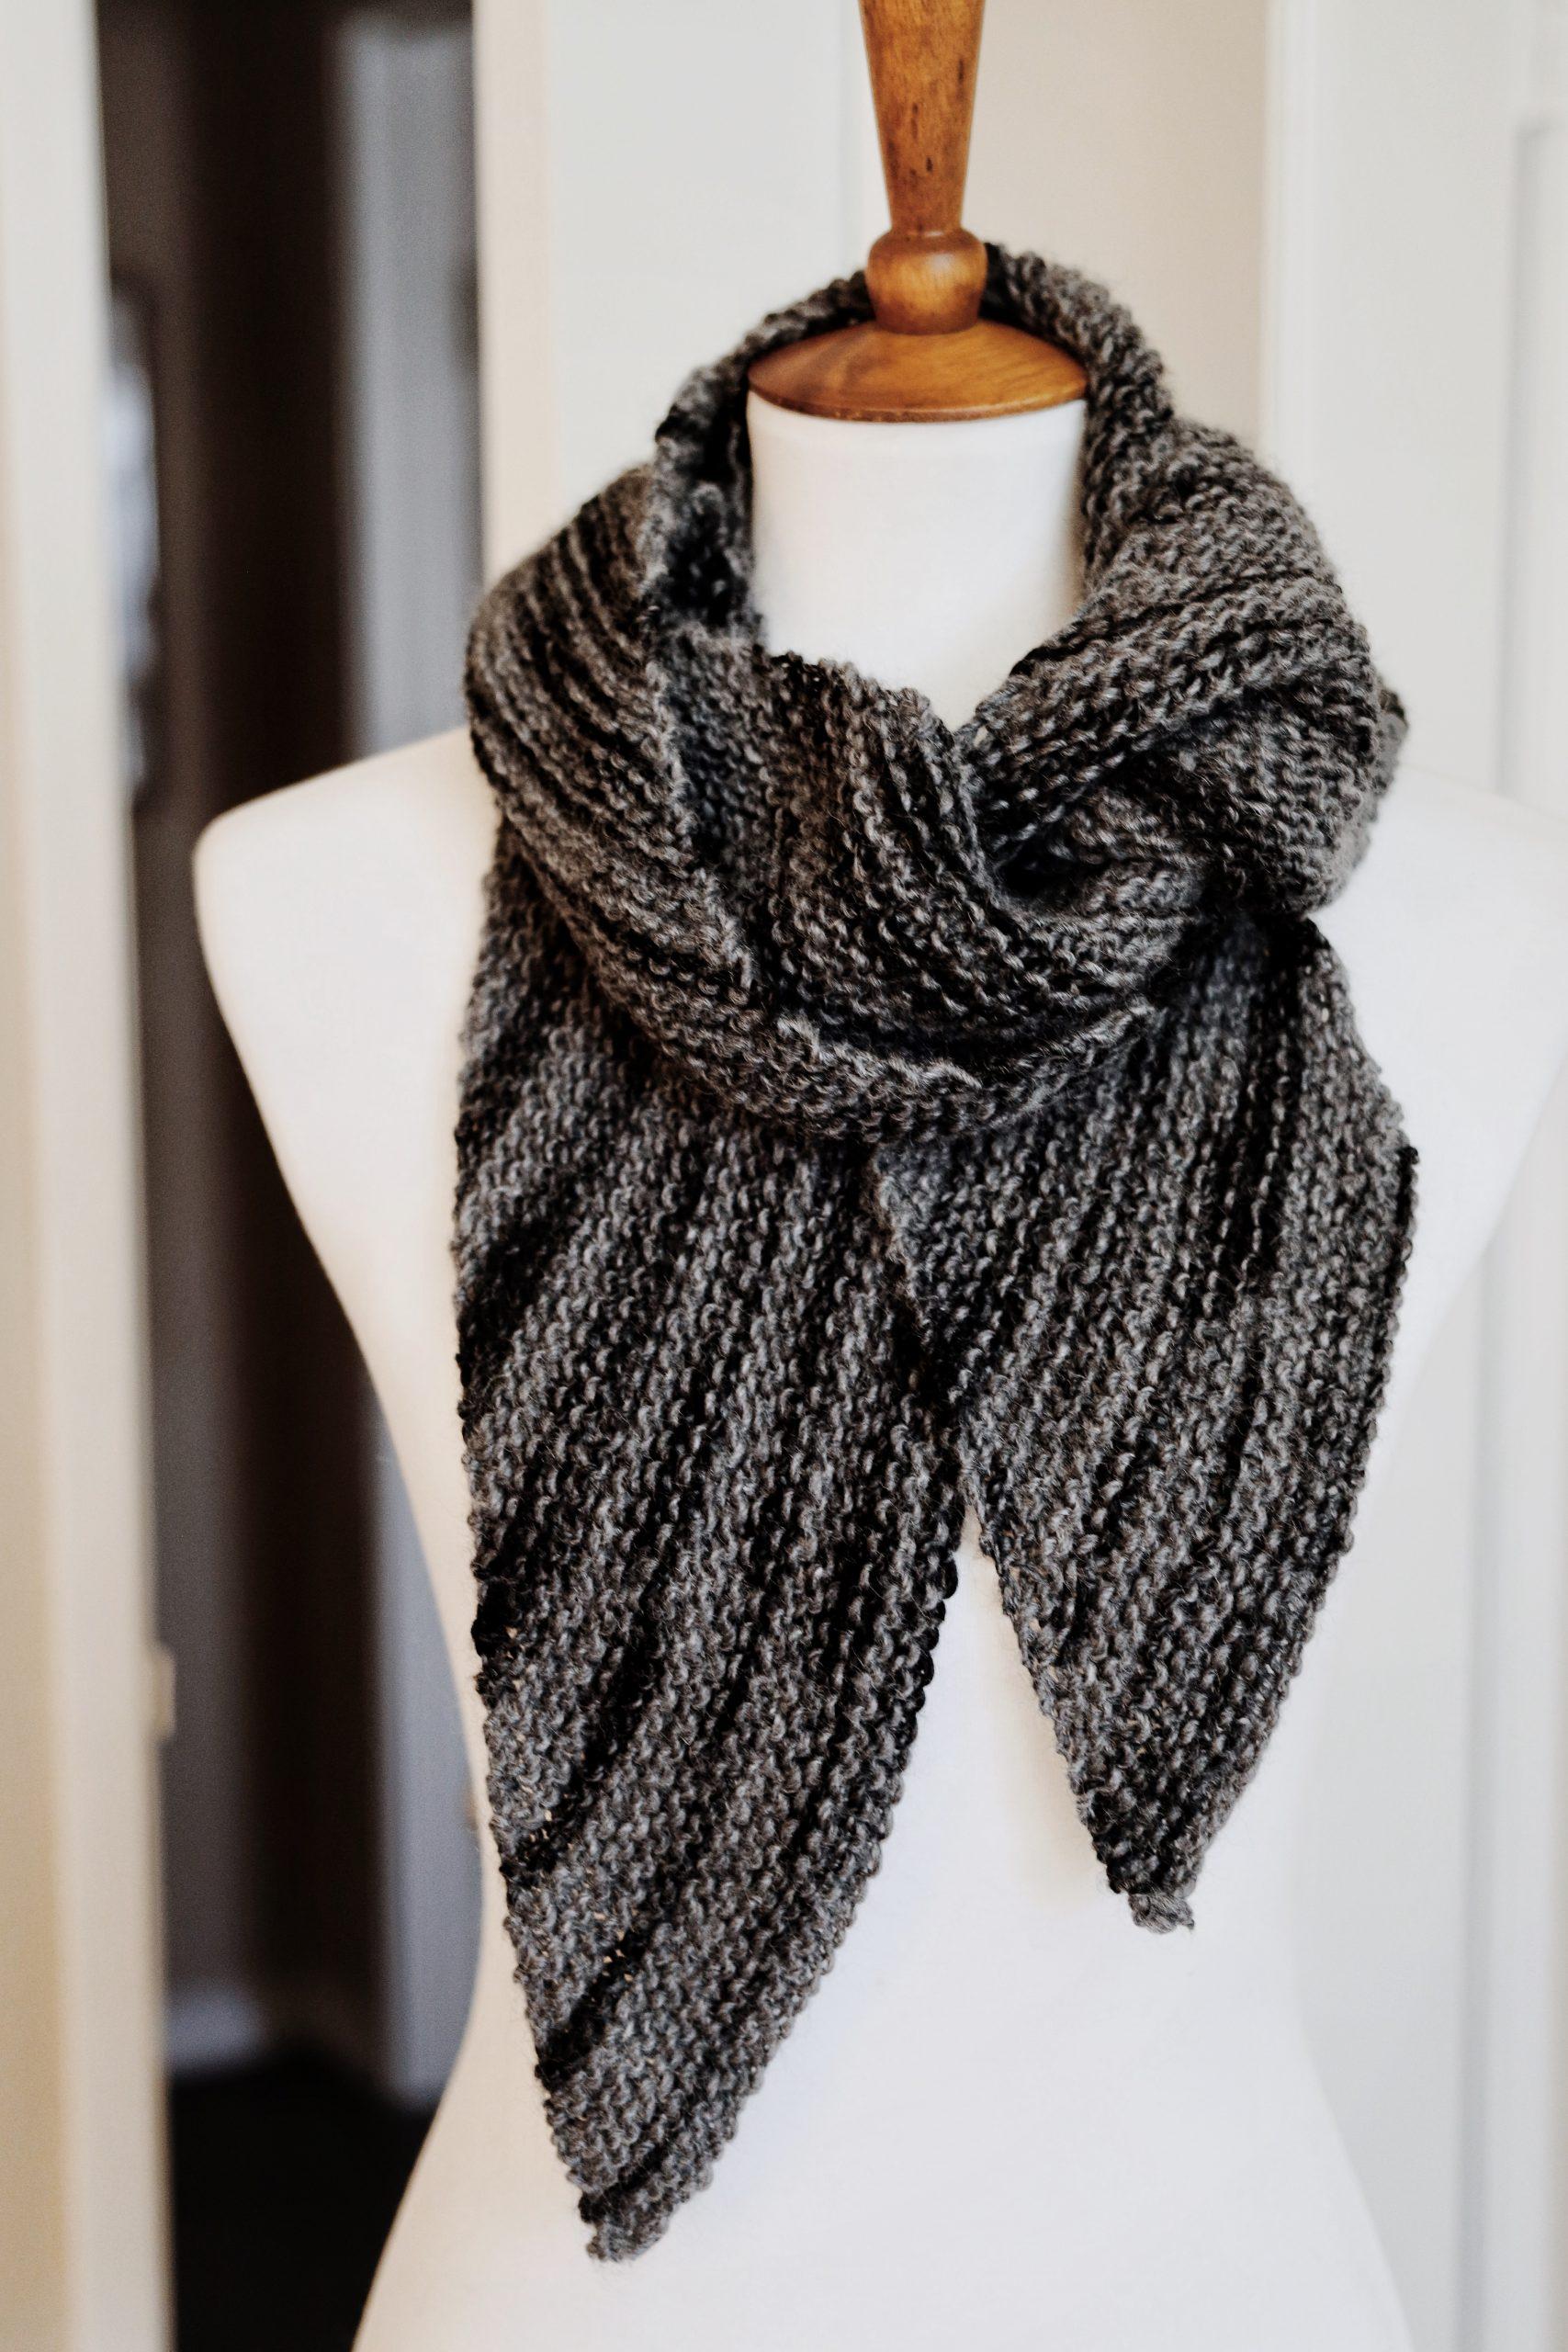 Bias Knit Men's Scarf Knitting Pattern by Darling Jadore ...